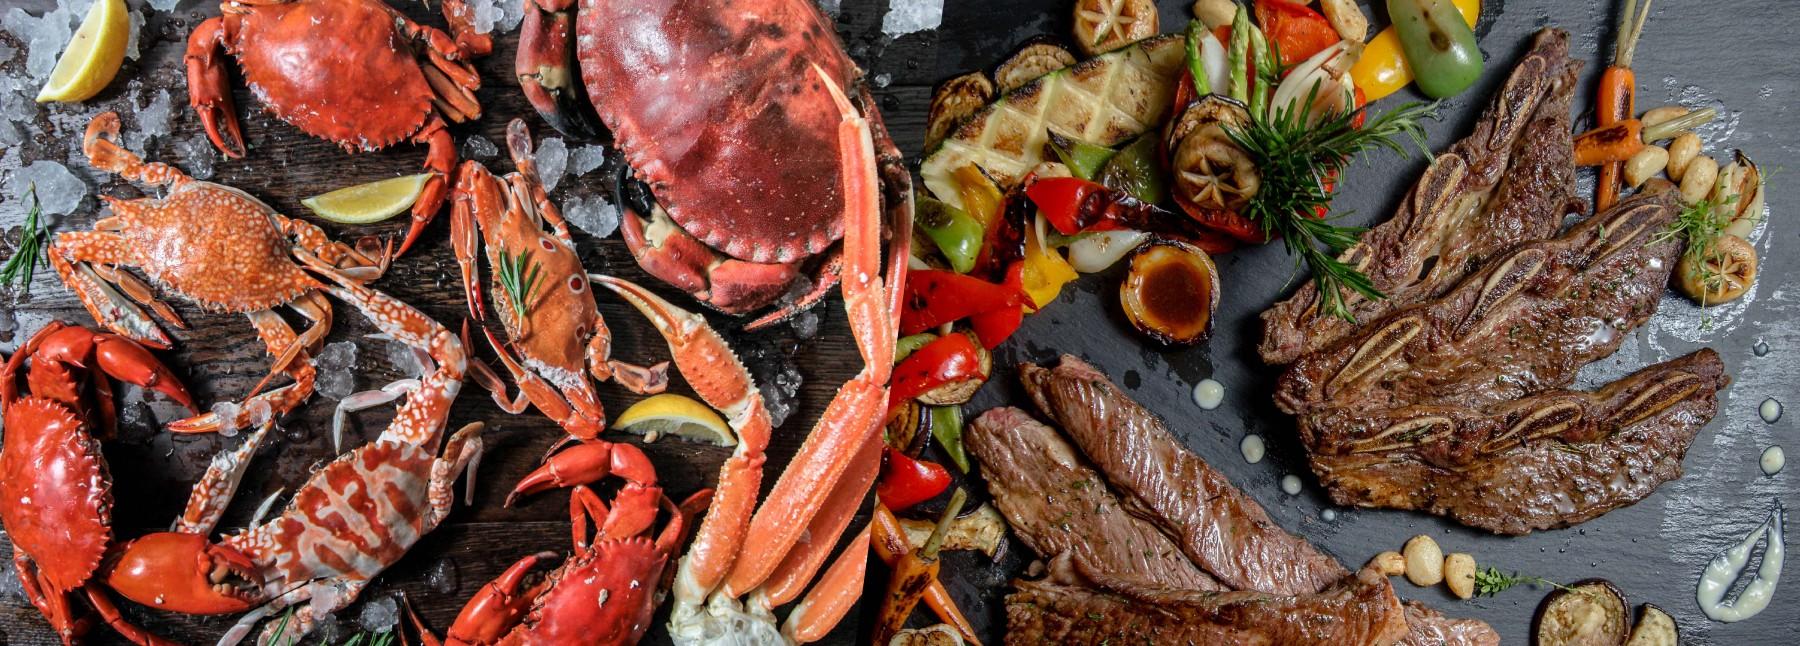 world-crabs-and-beef-asado